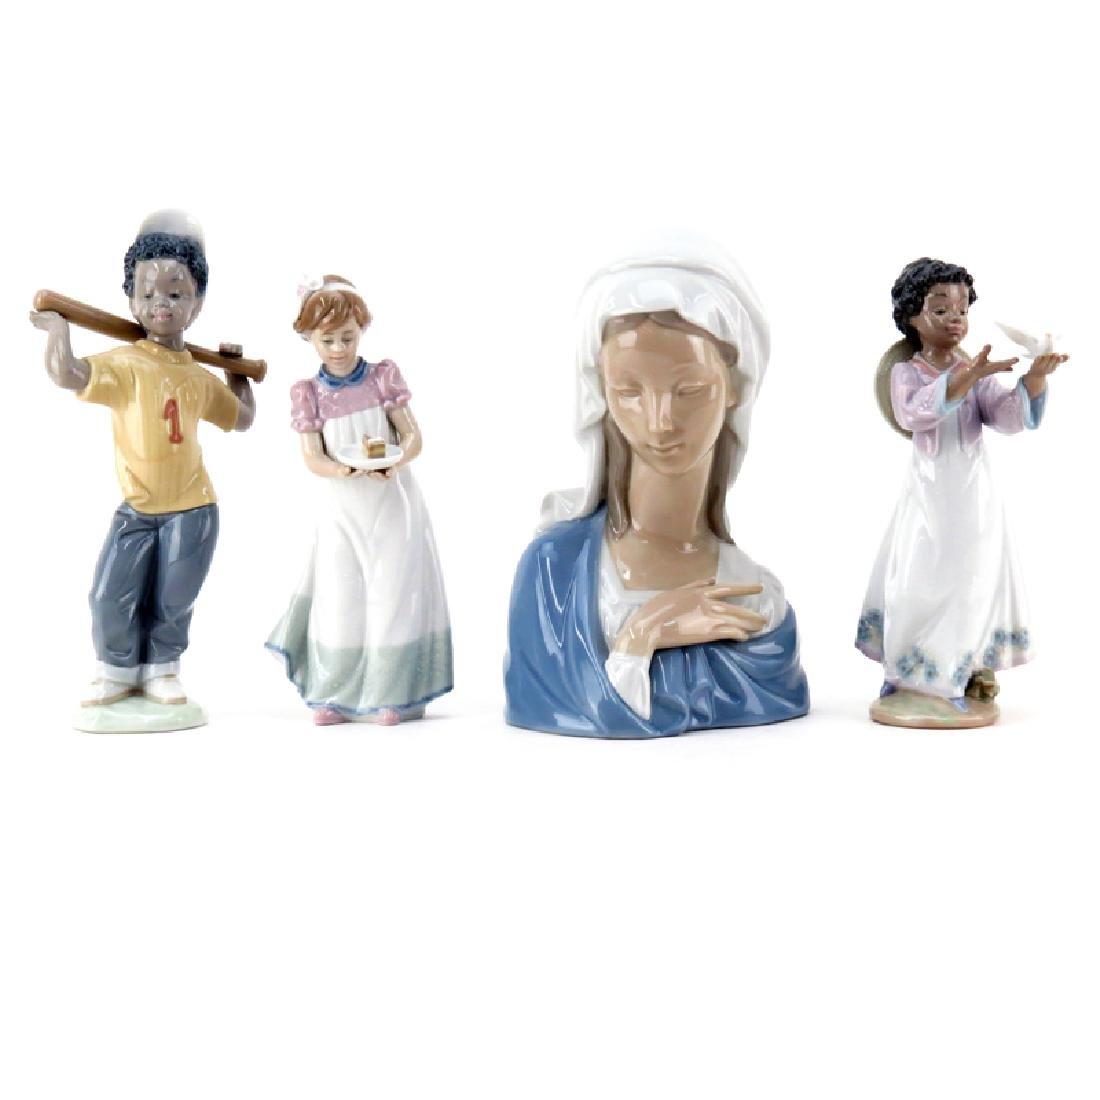 Grouping of Four (4) Lladro Glazed Porcelain Figurine.